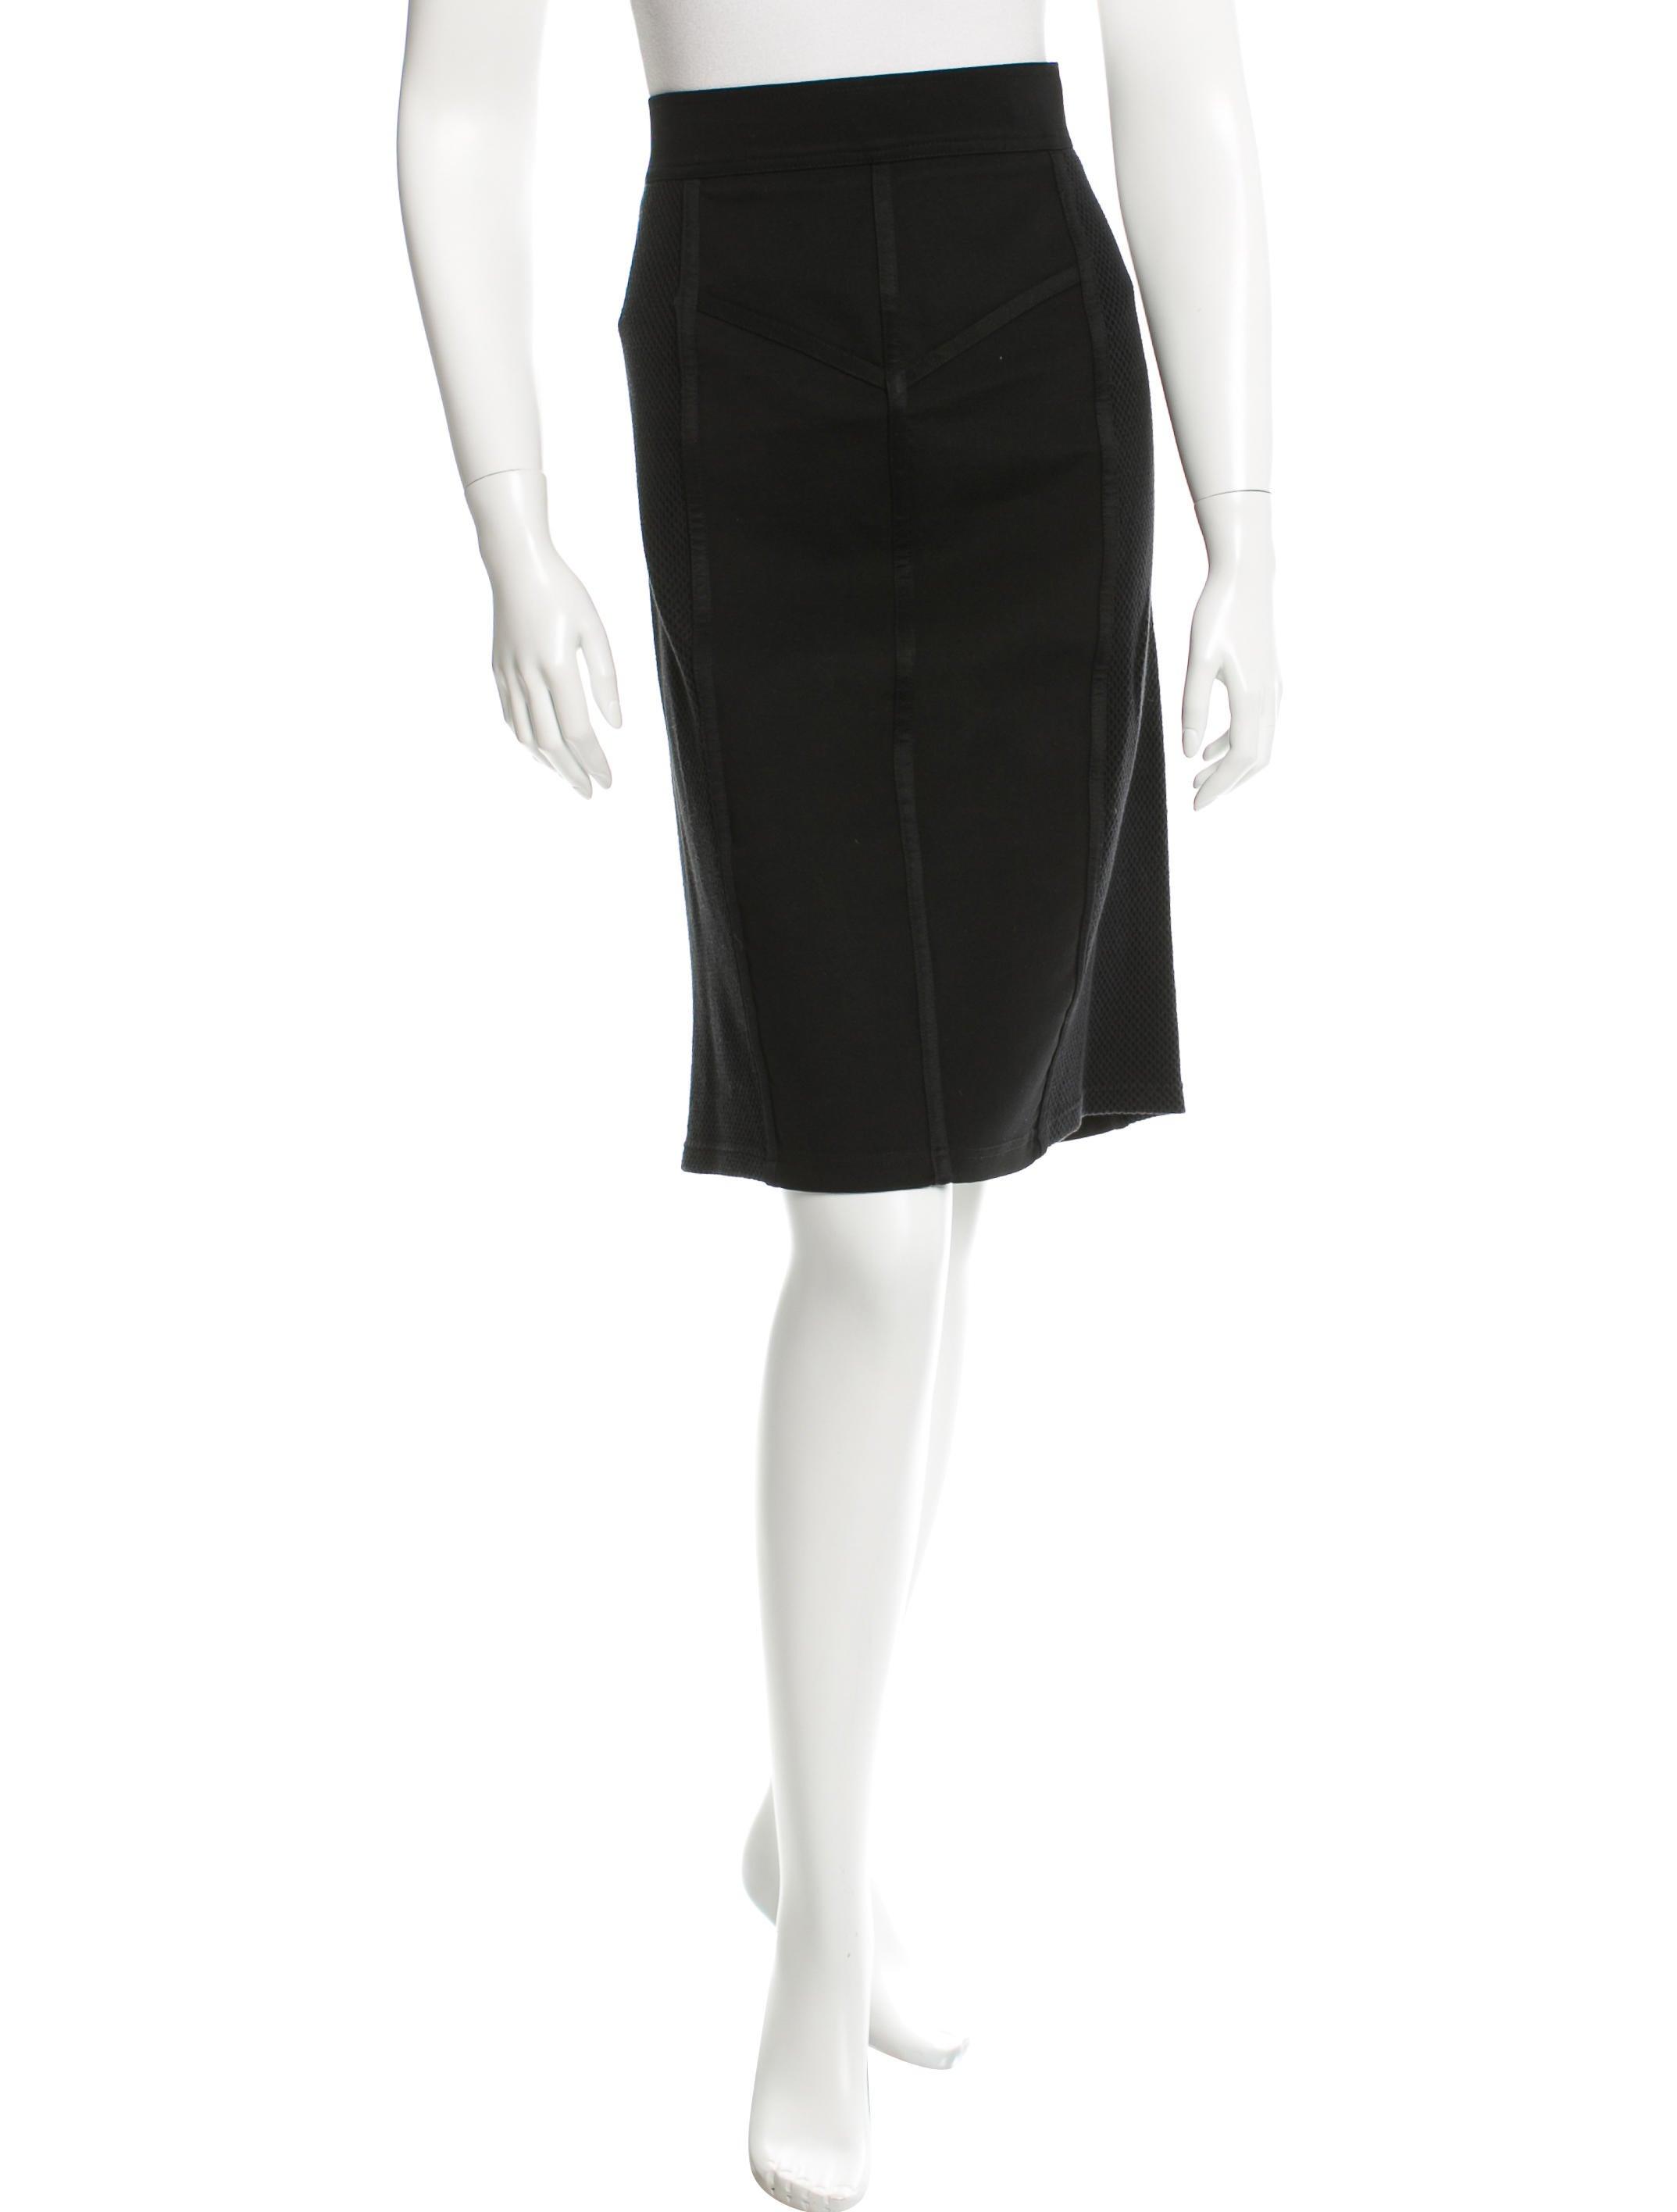 burberry knee length knit paneled skirt clothing